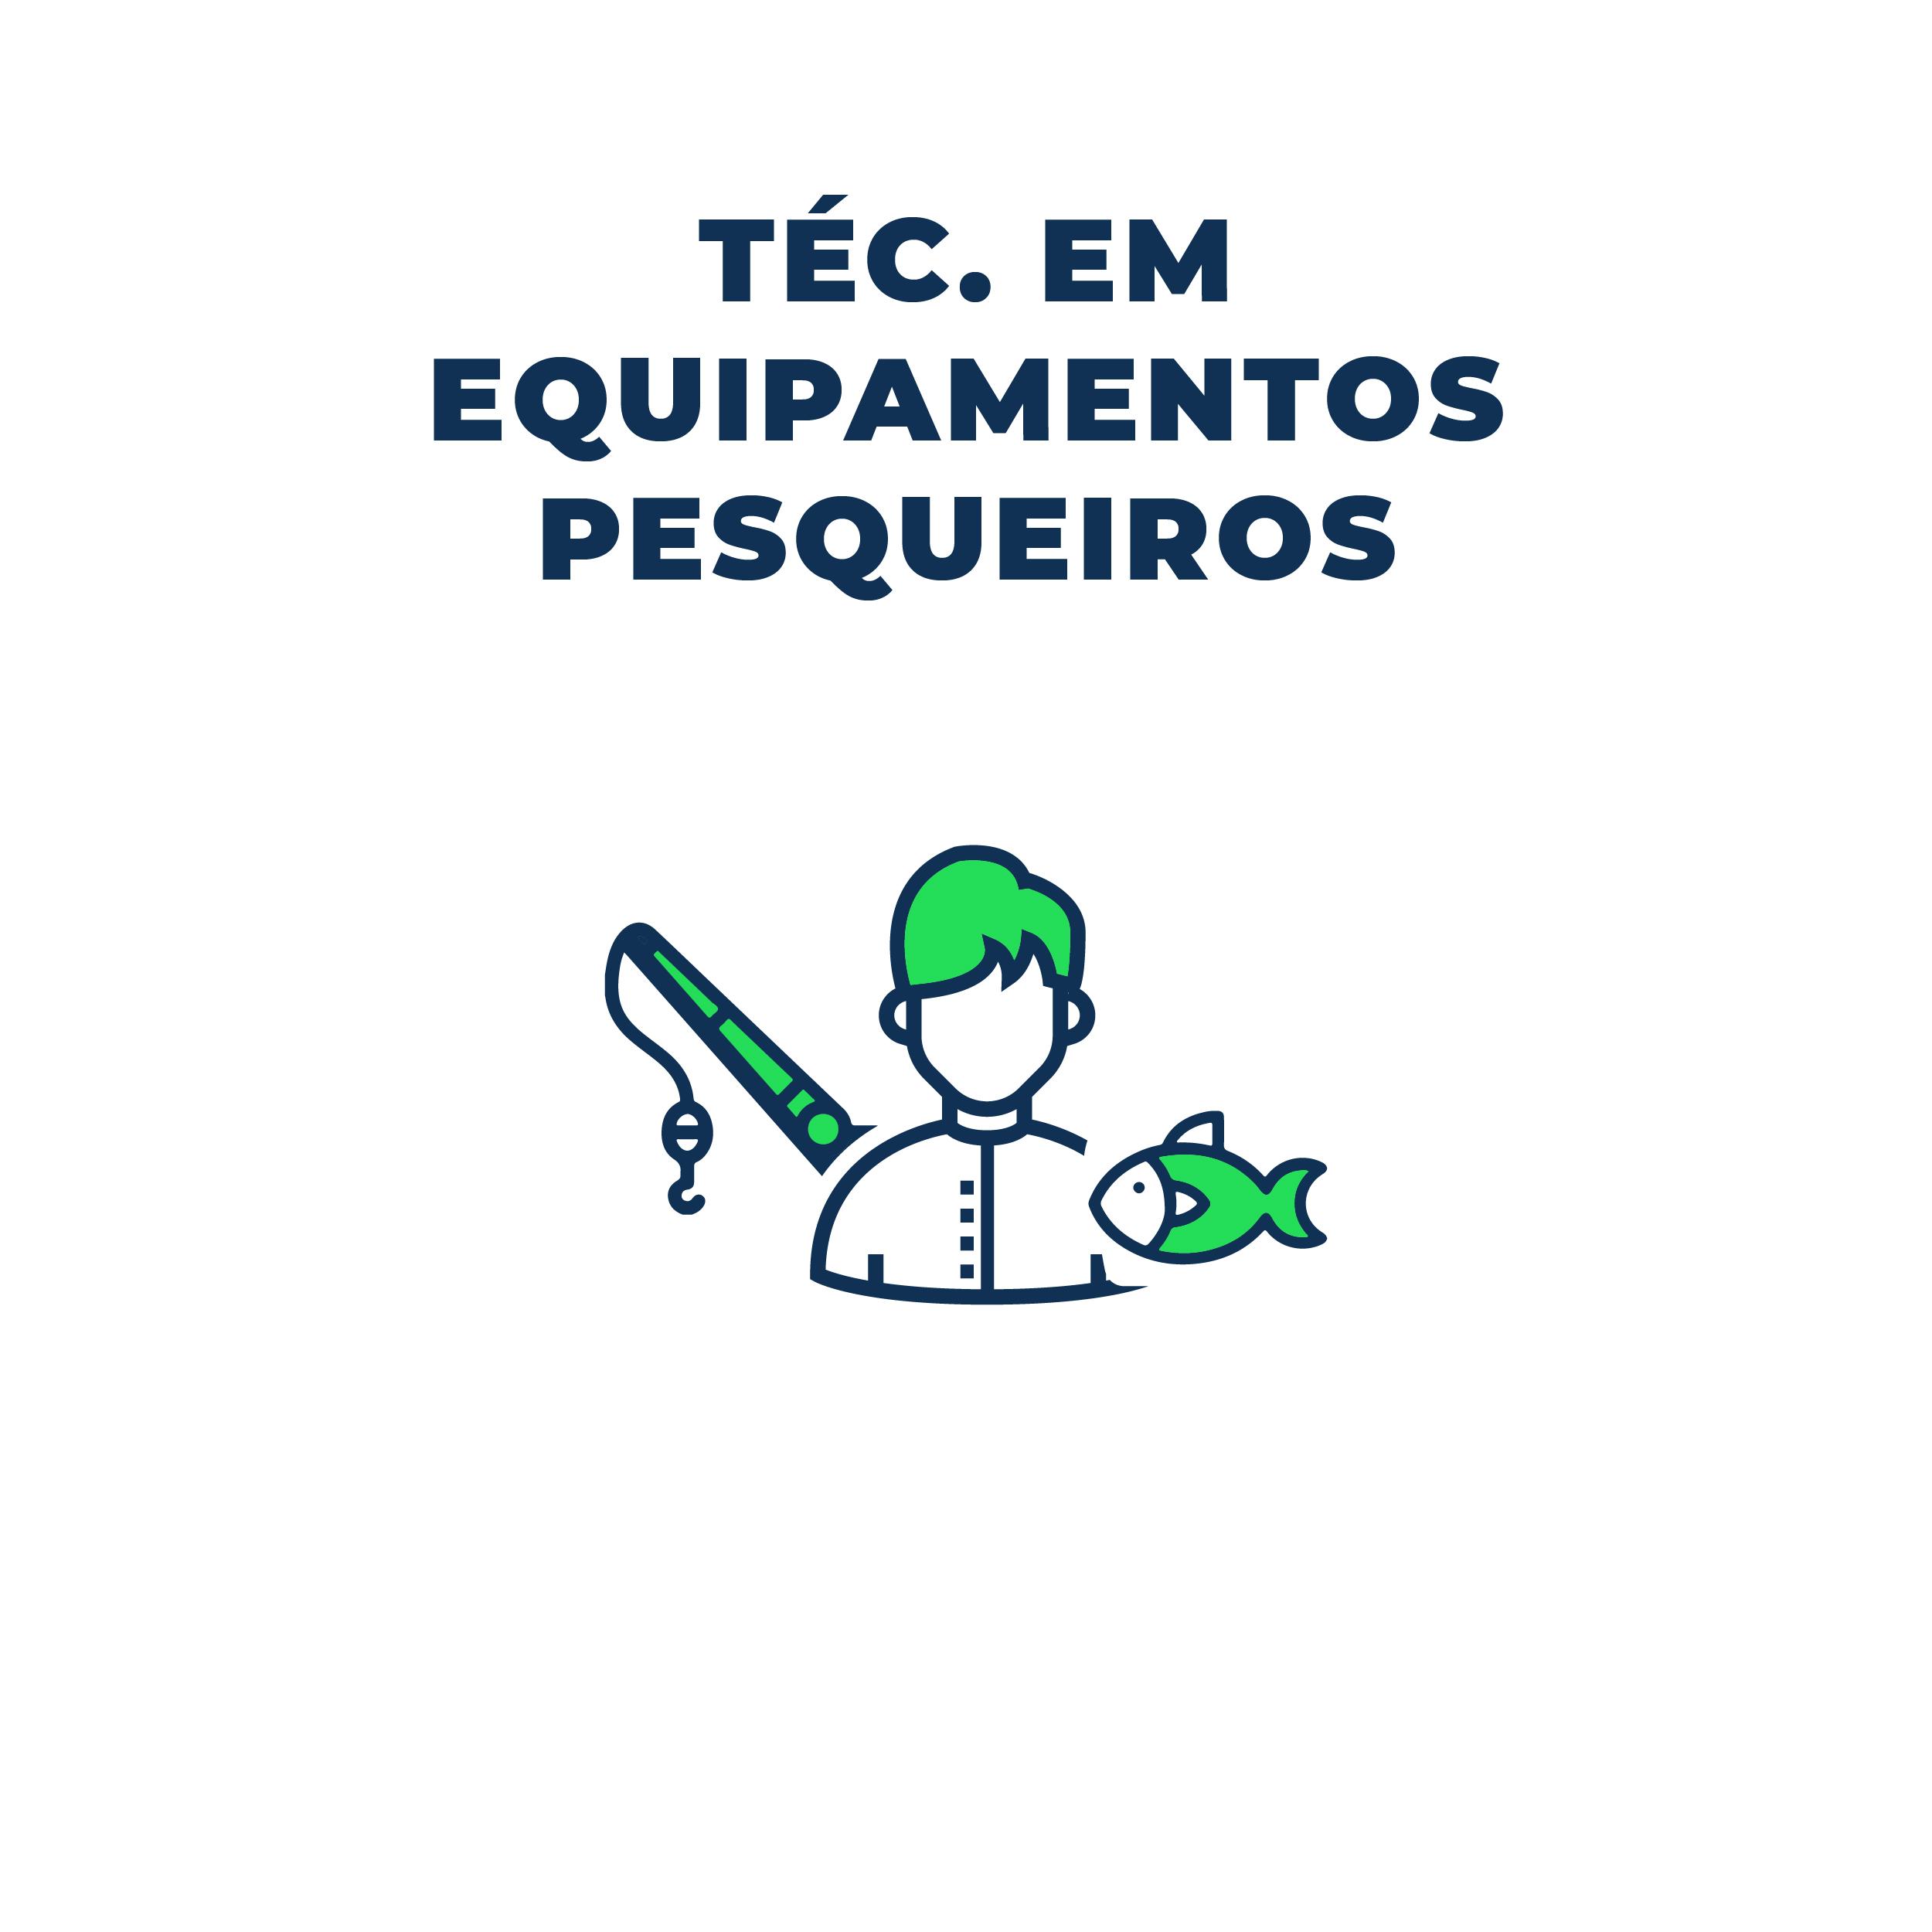 equipamento pesqueiros